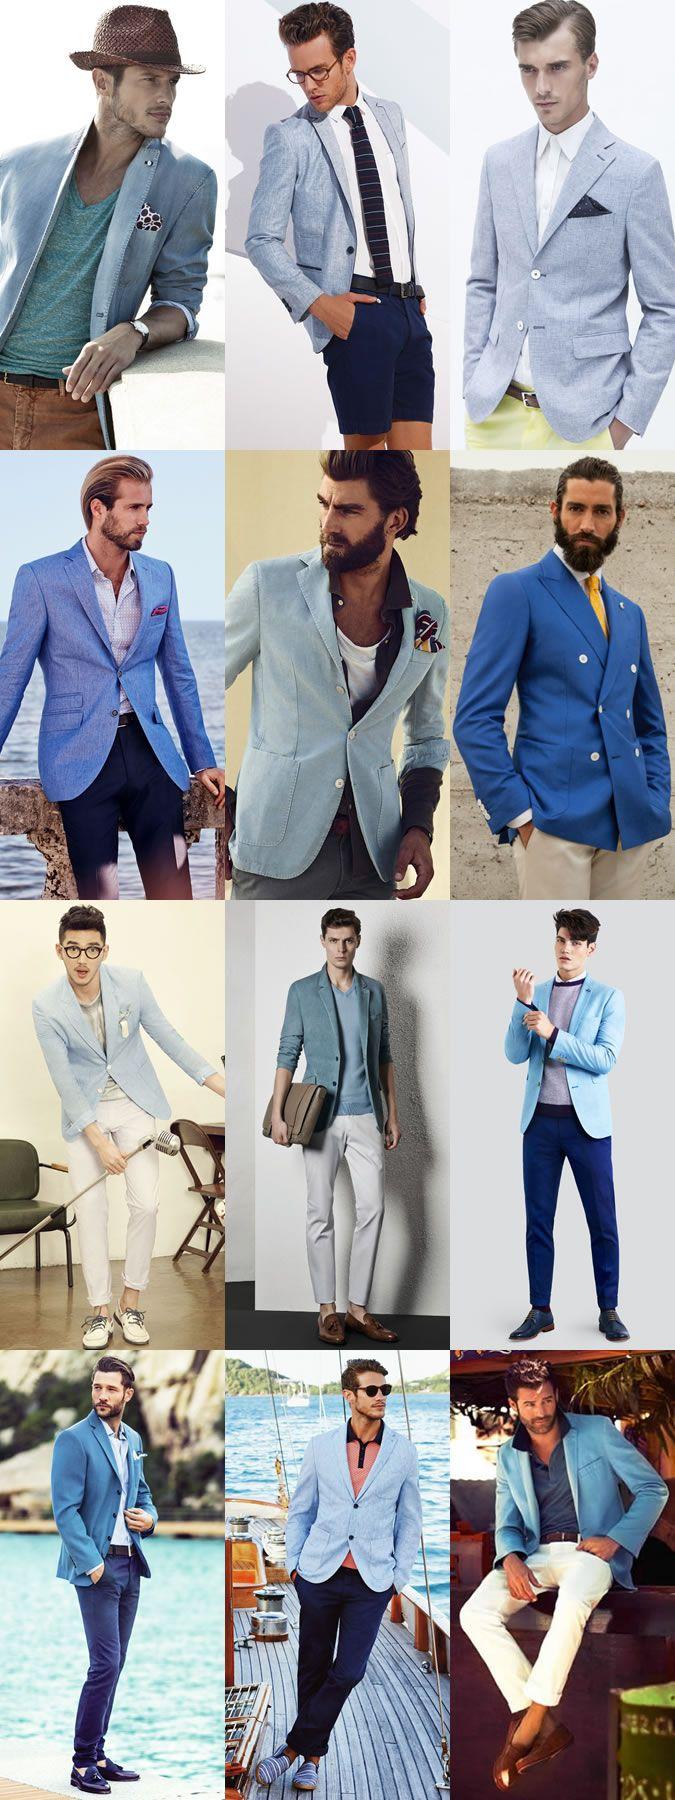 Men's Blue Blazers Spring/Summer Outfit Inspiration Lookbook